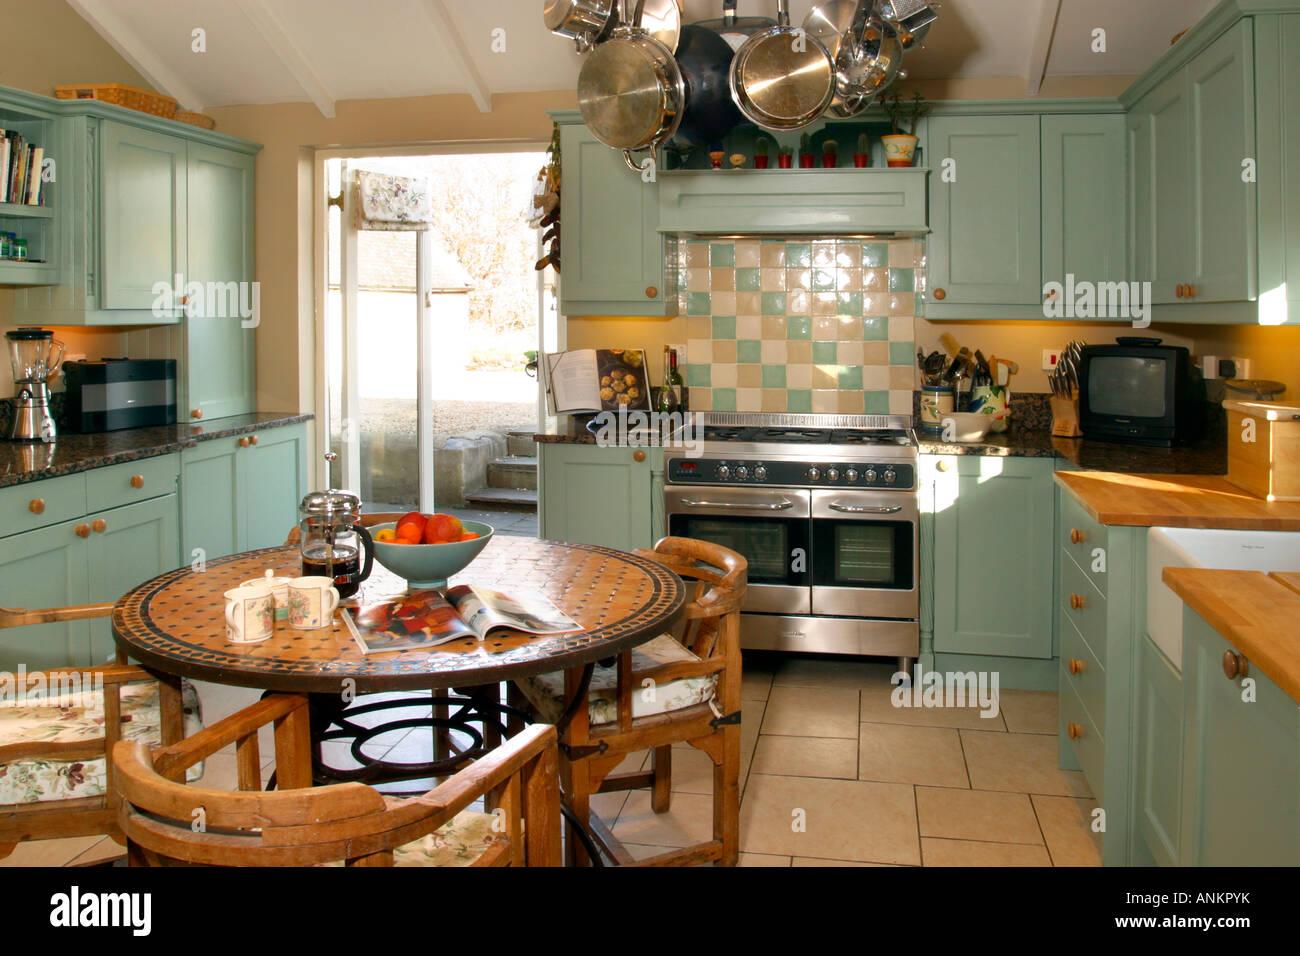 Modern Painted House Stockfotos & Modern Painted House Bilder - Alamy